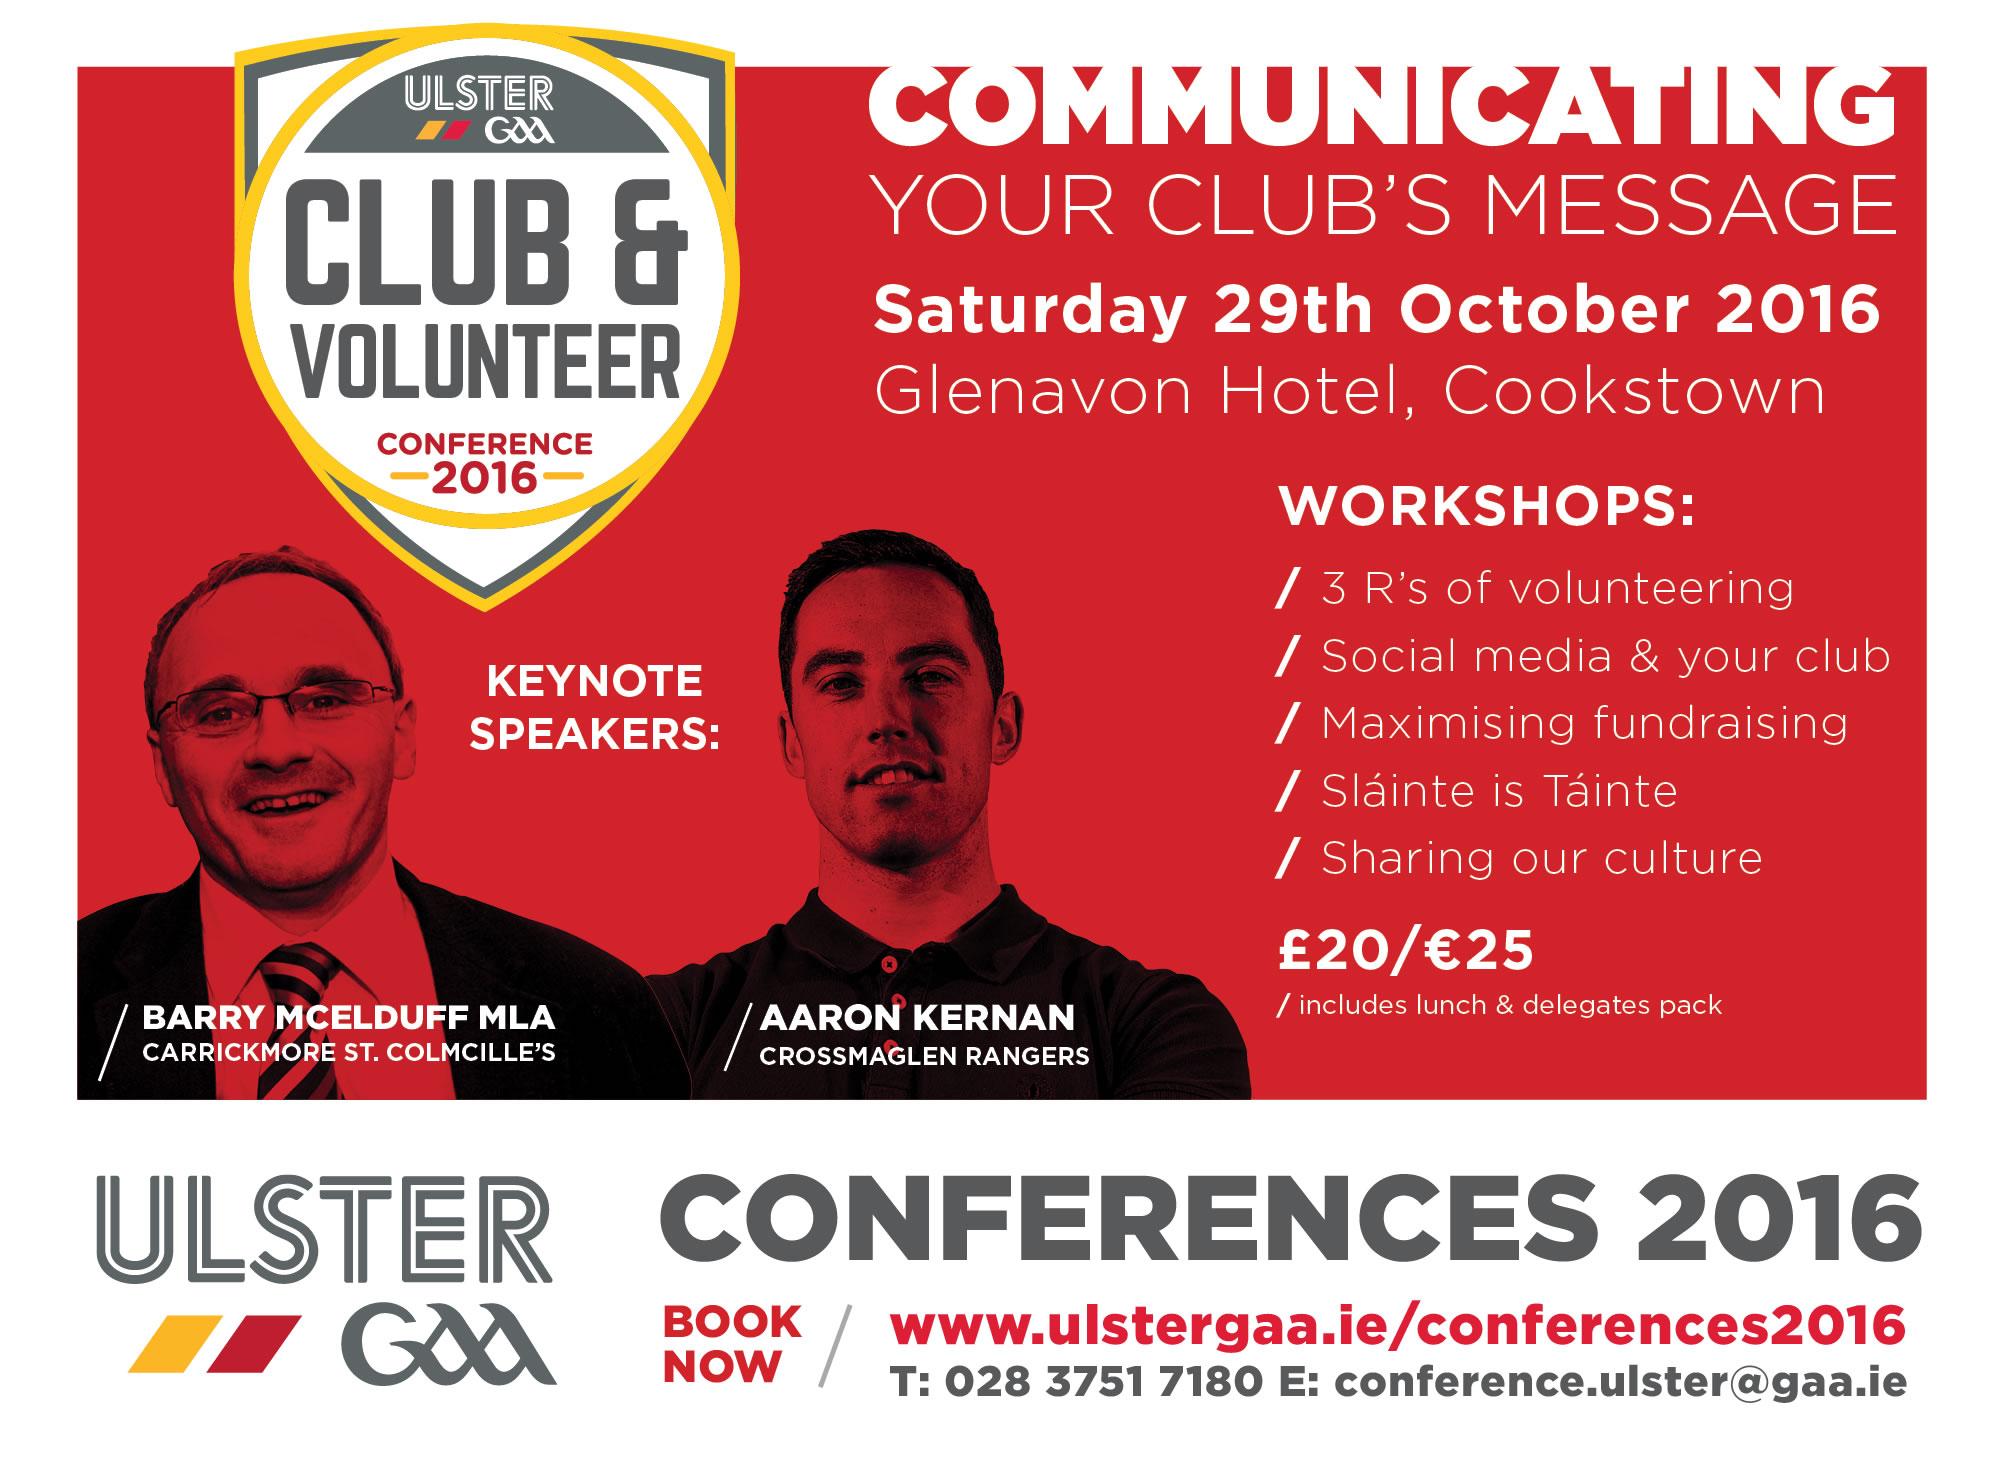 Ulster GAA Club & Volunteer Conference